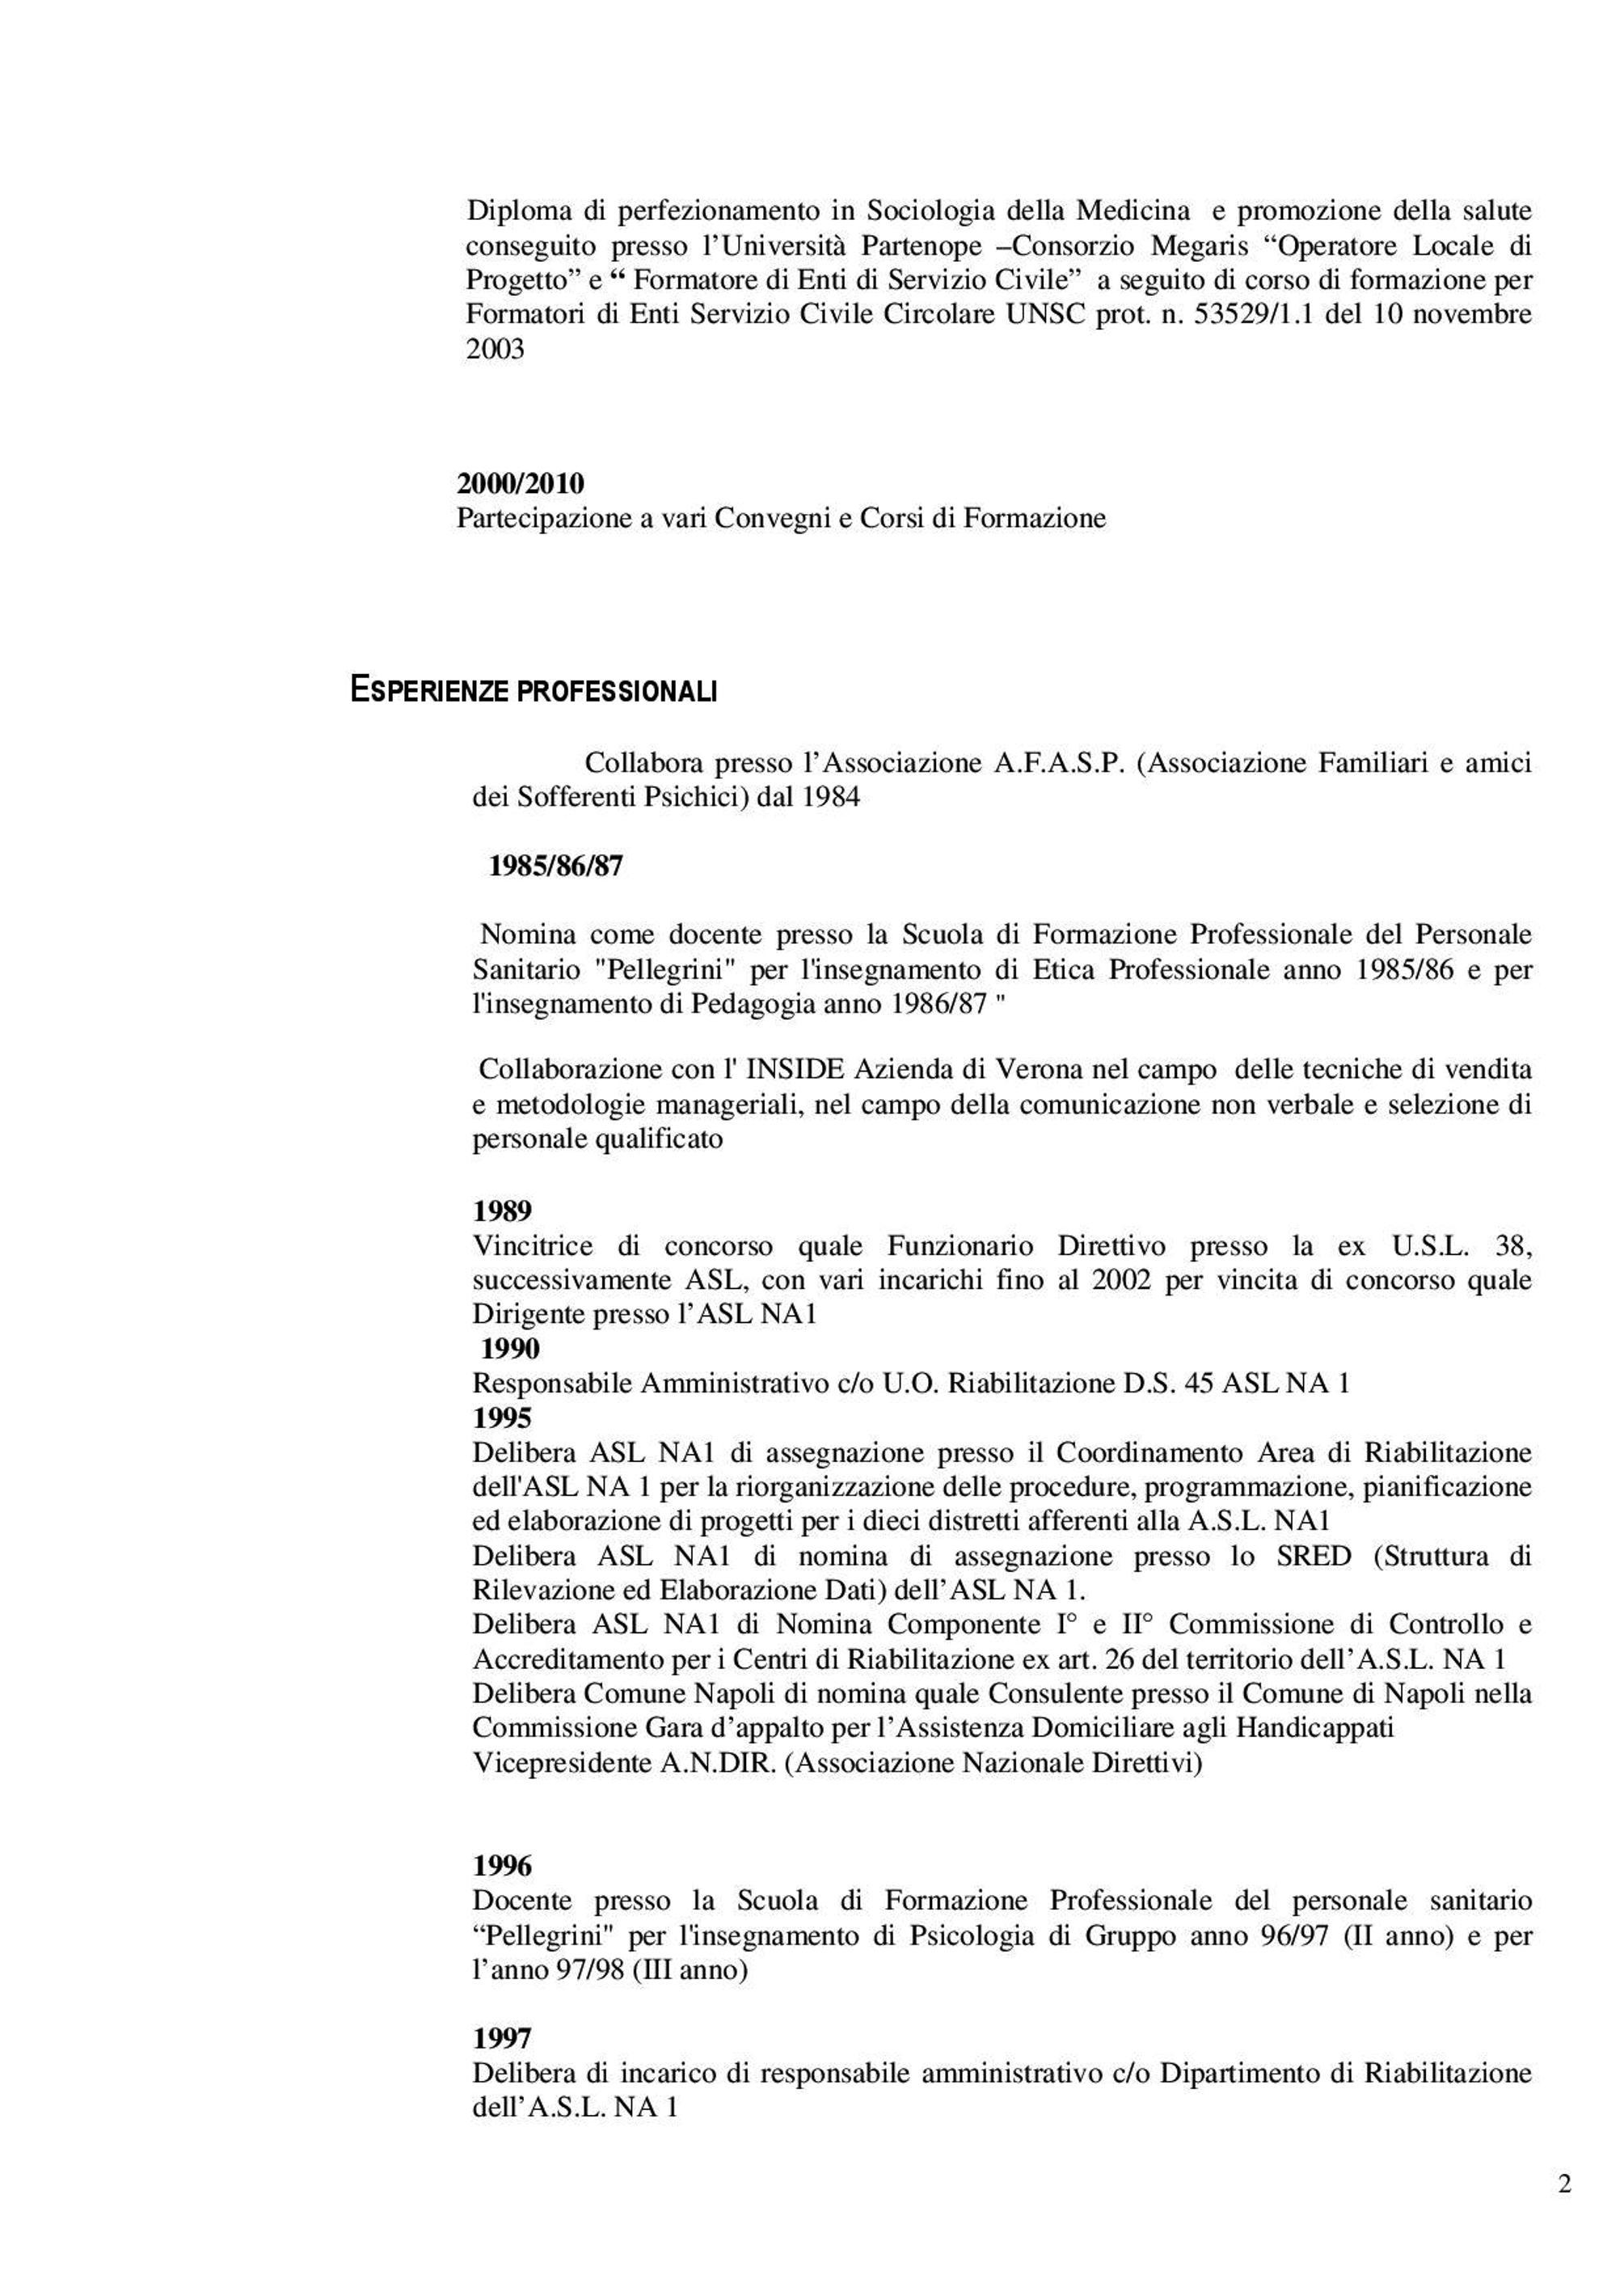 CUURICULUM MUSELLA FORMATO EUROPEO-page-002